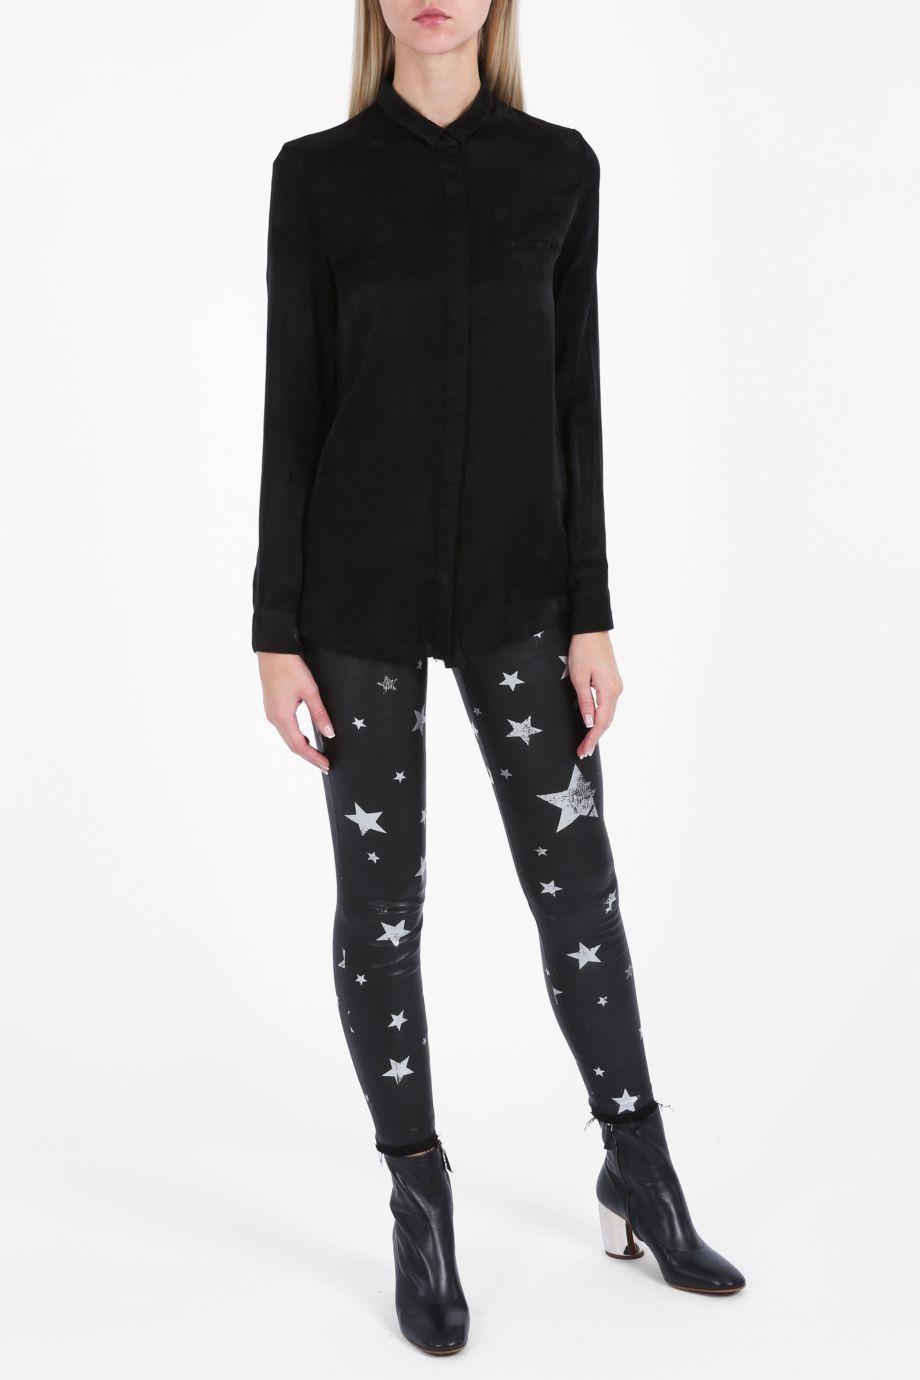 Rta Celeste Star Shirt